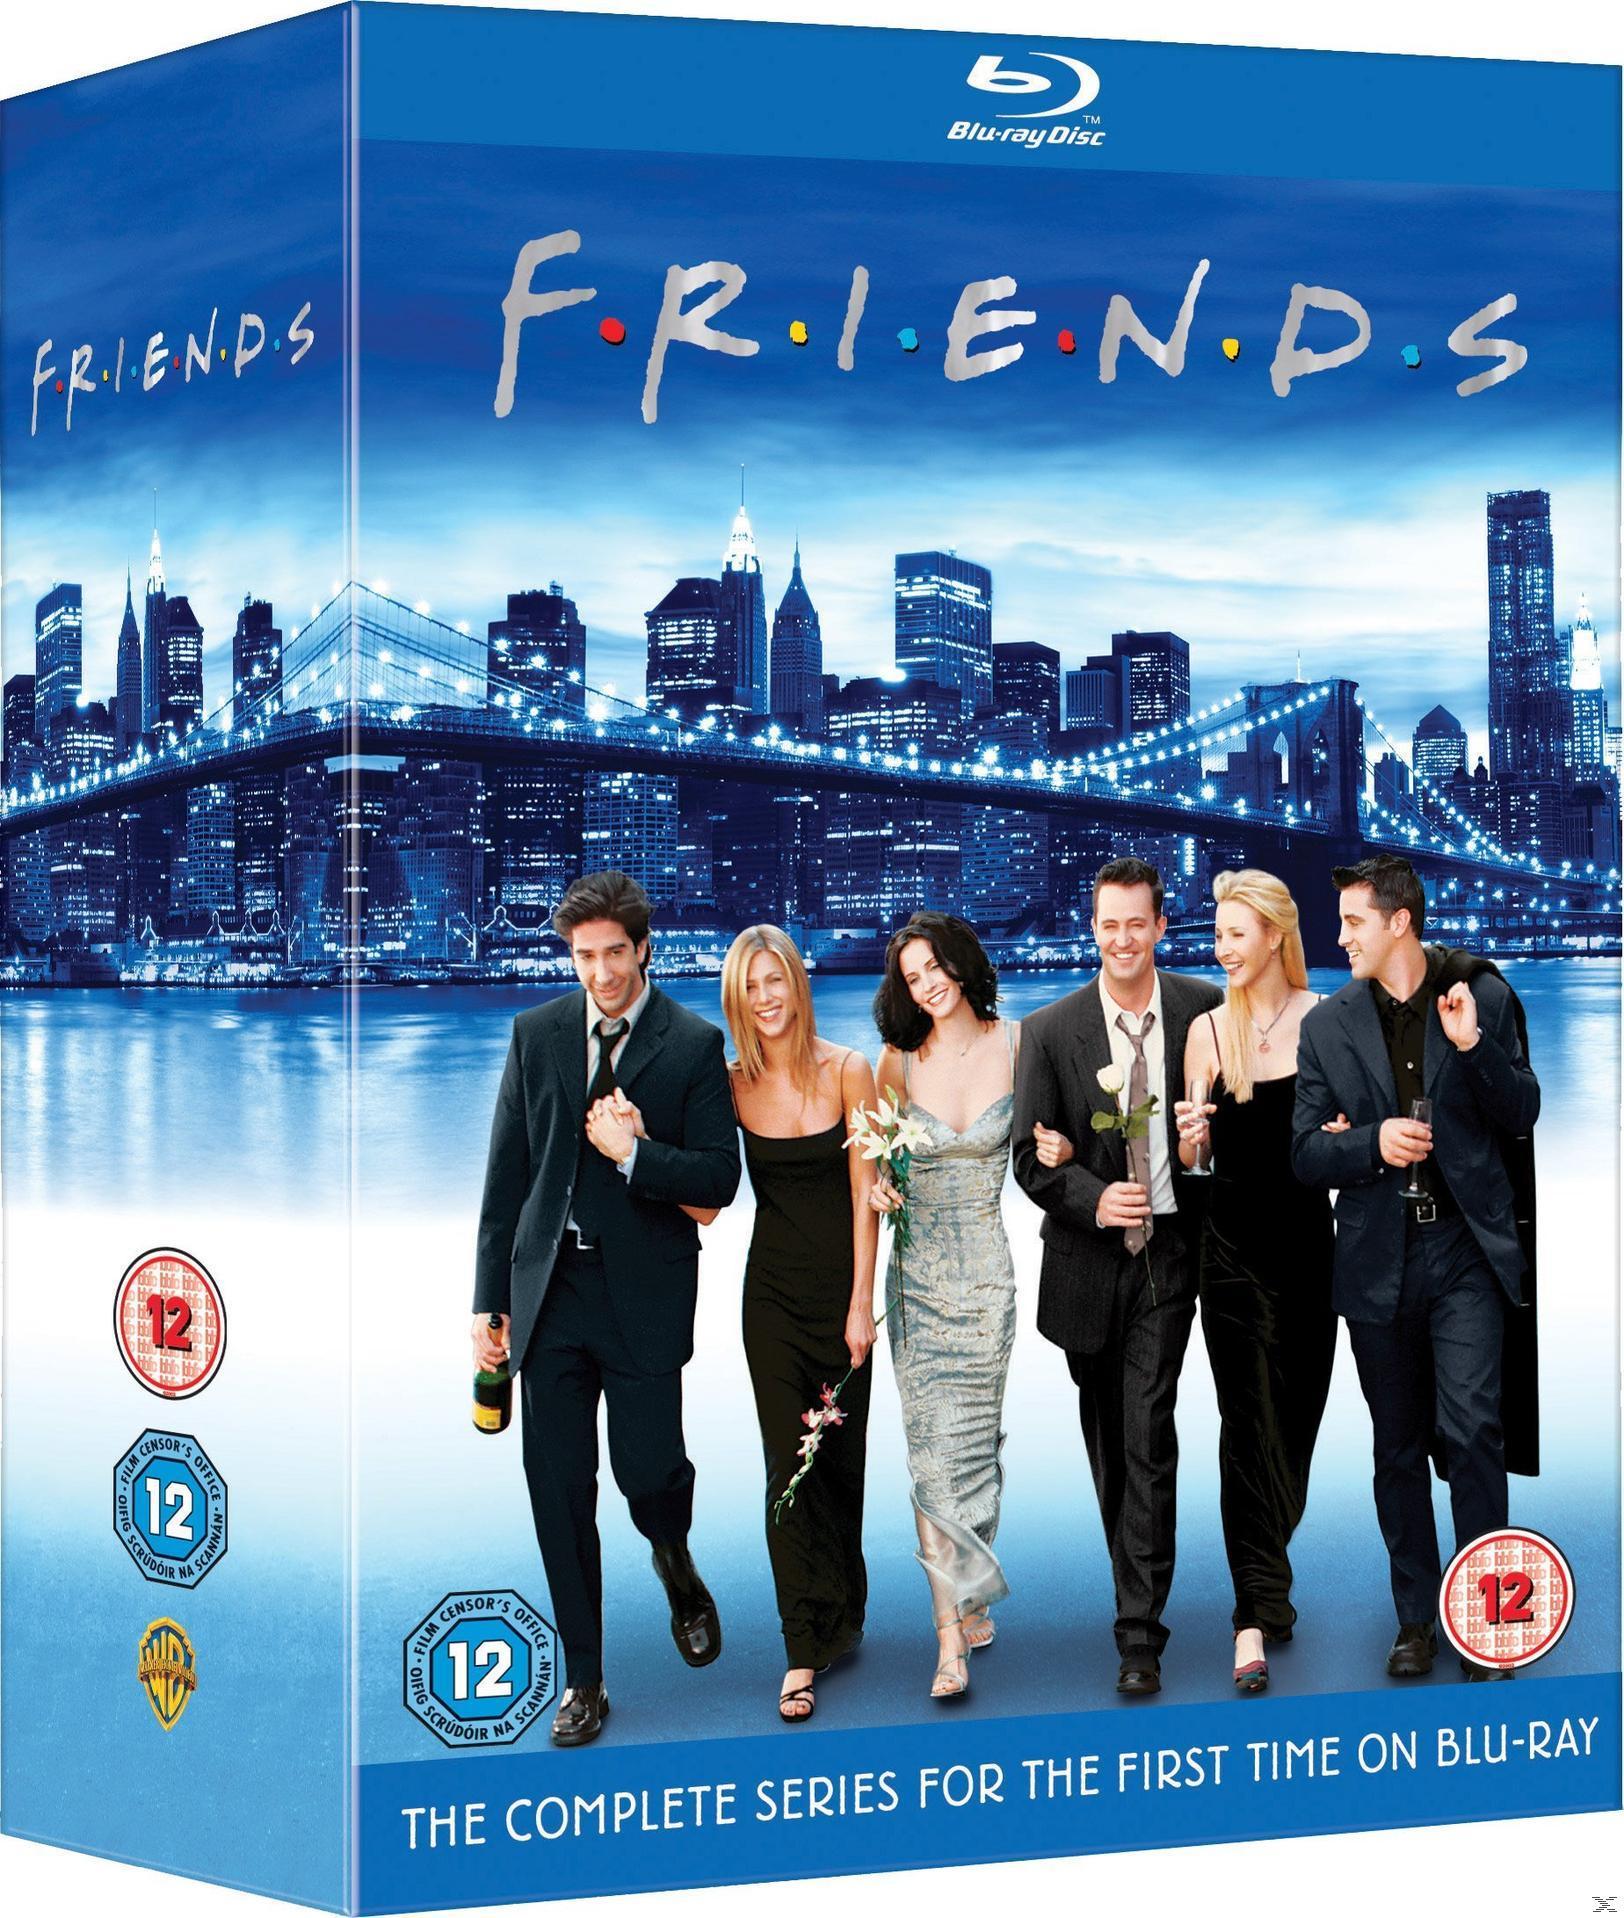 Friends: Series 1-10 Bluray Box